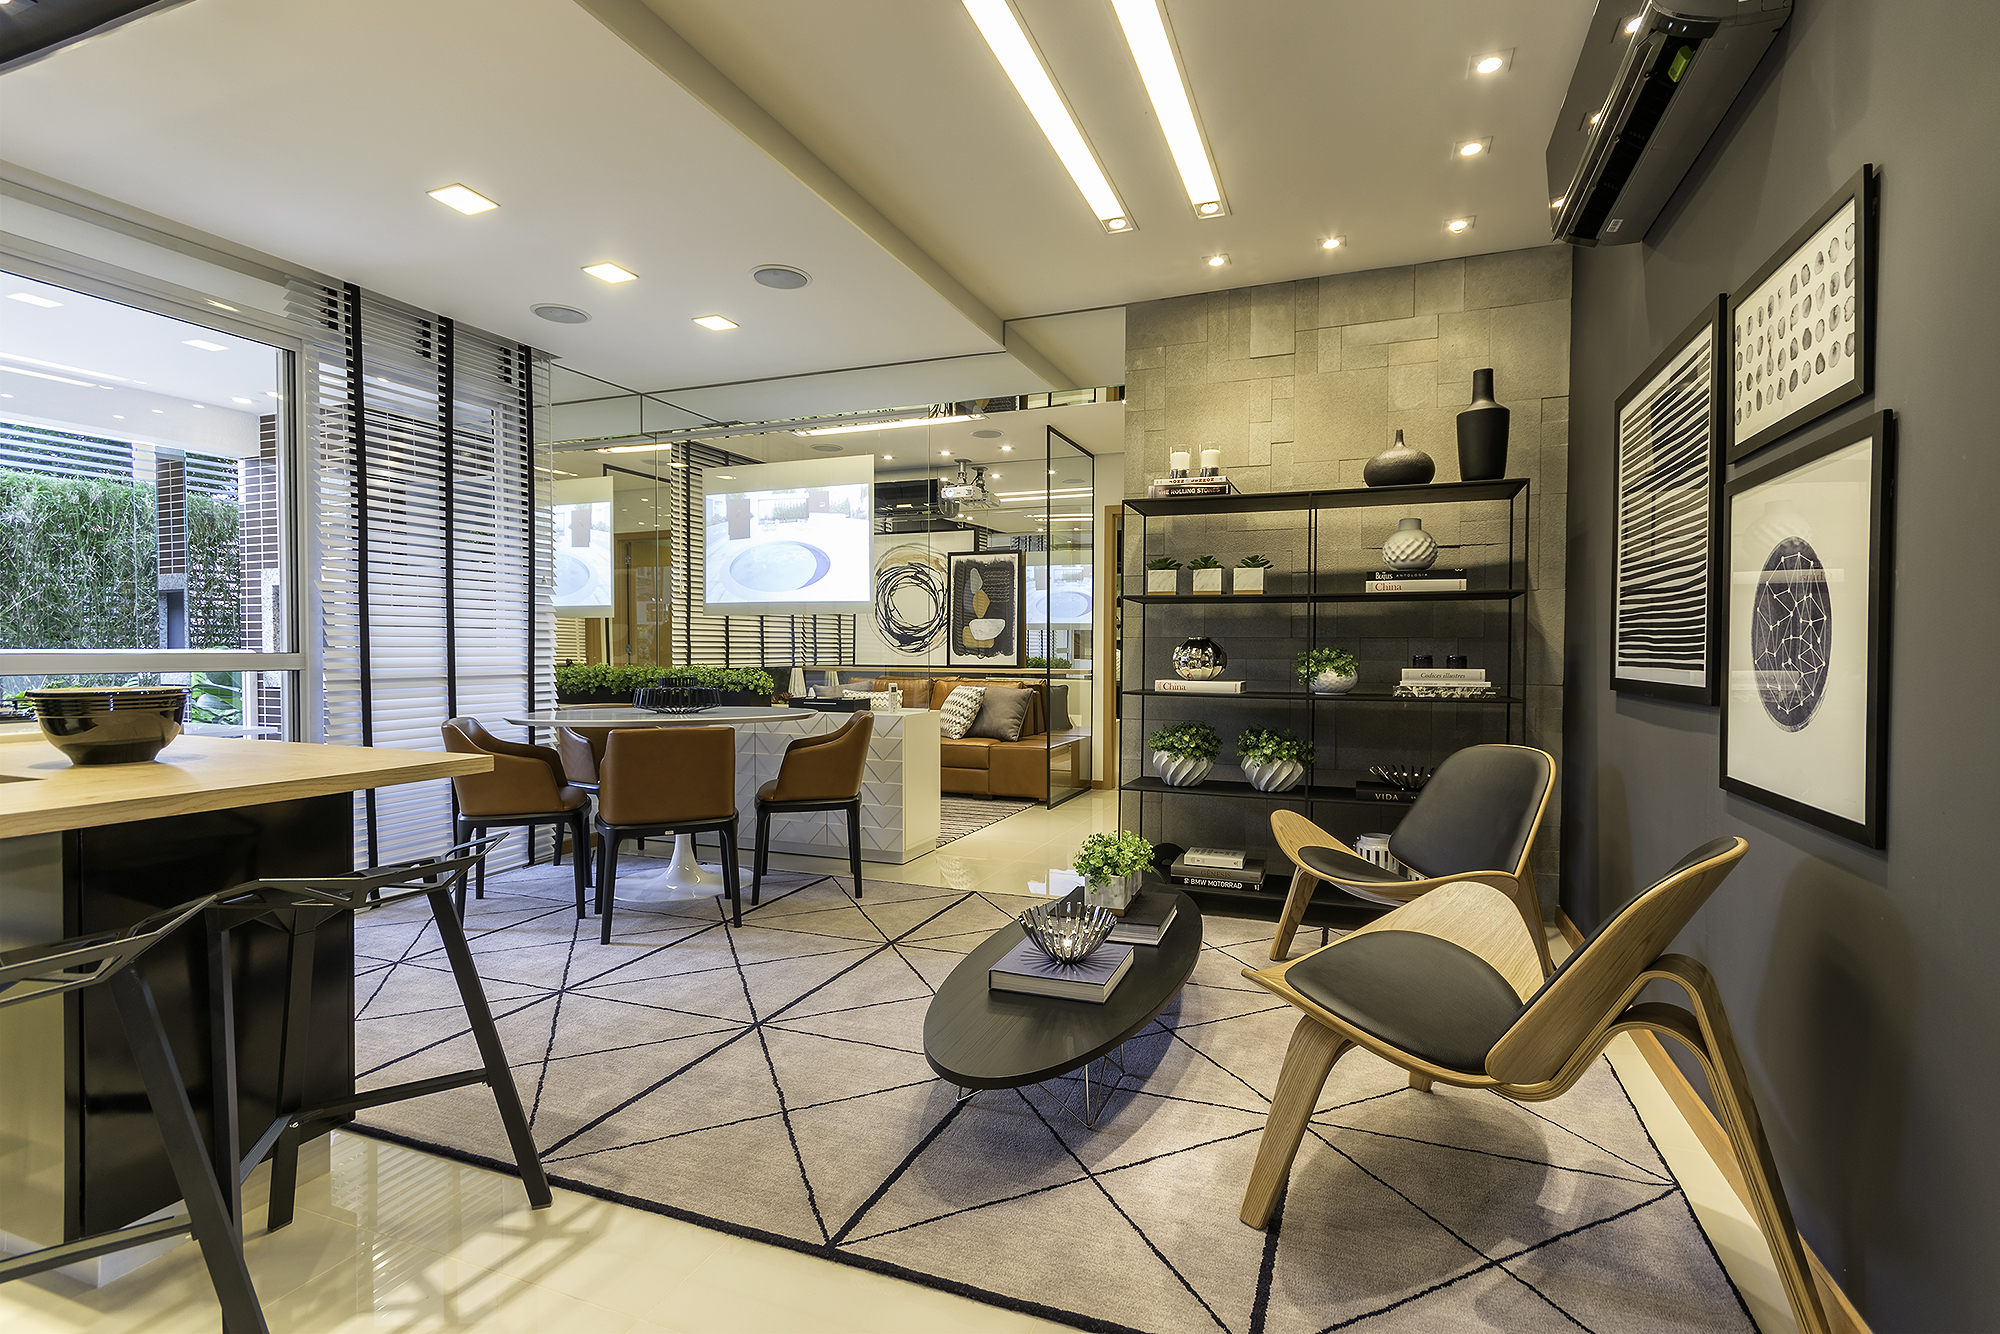 Apartamento Com Pe As Dos Anos 60 Tem O Cinza Como Cor Predominante